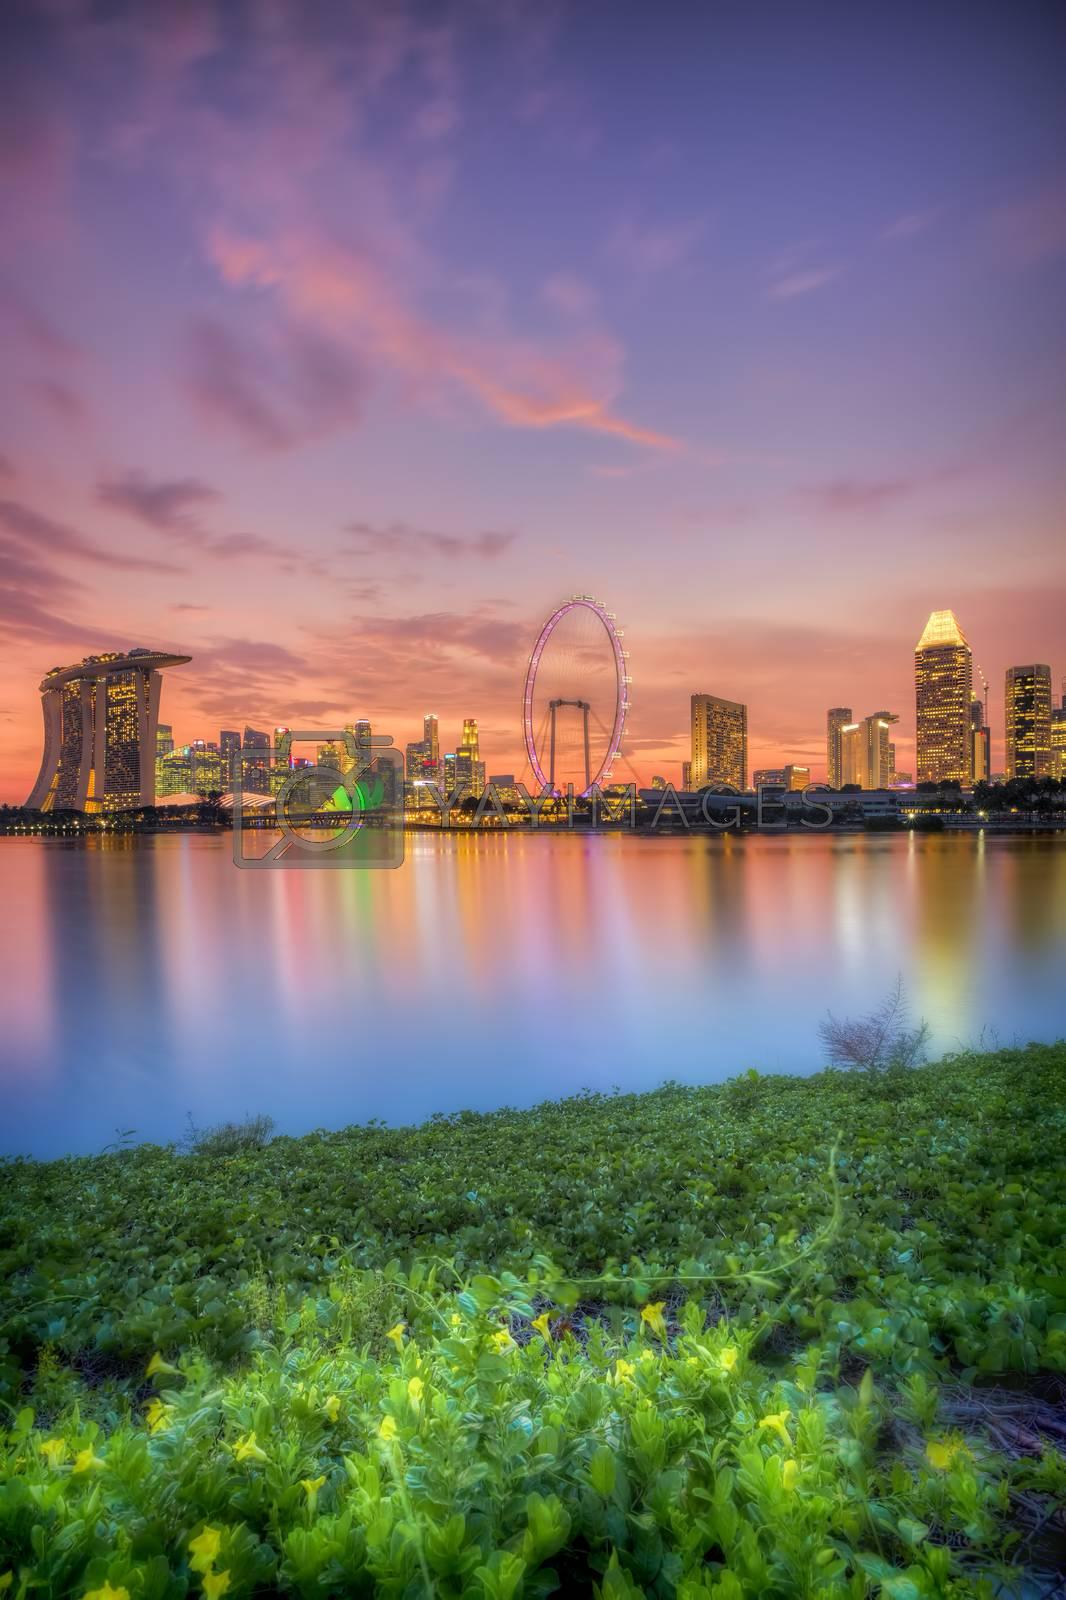 Royalty free image of Singapore Skyline at sunset by kjorgen